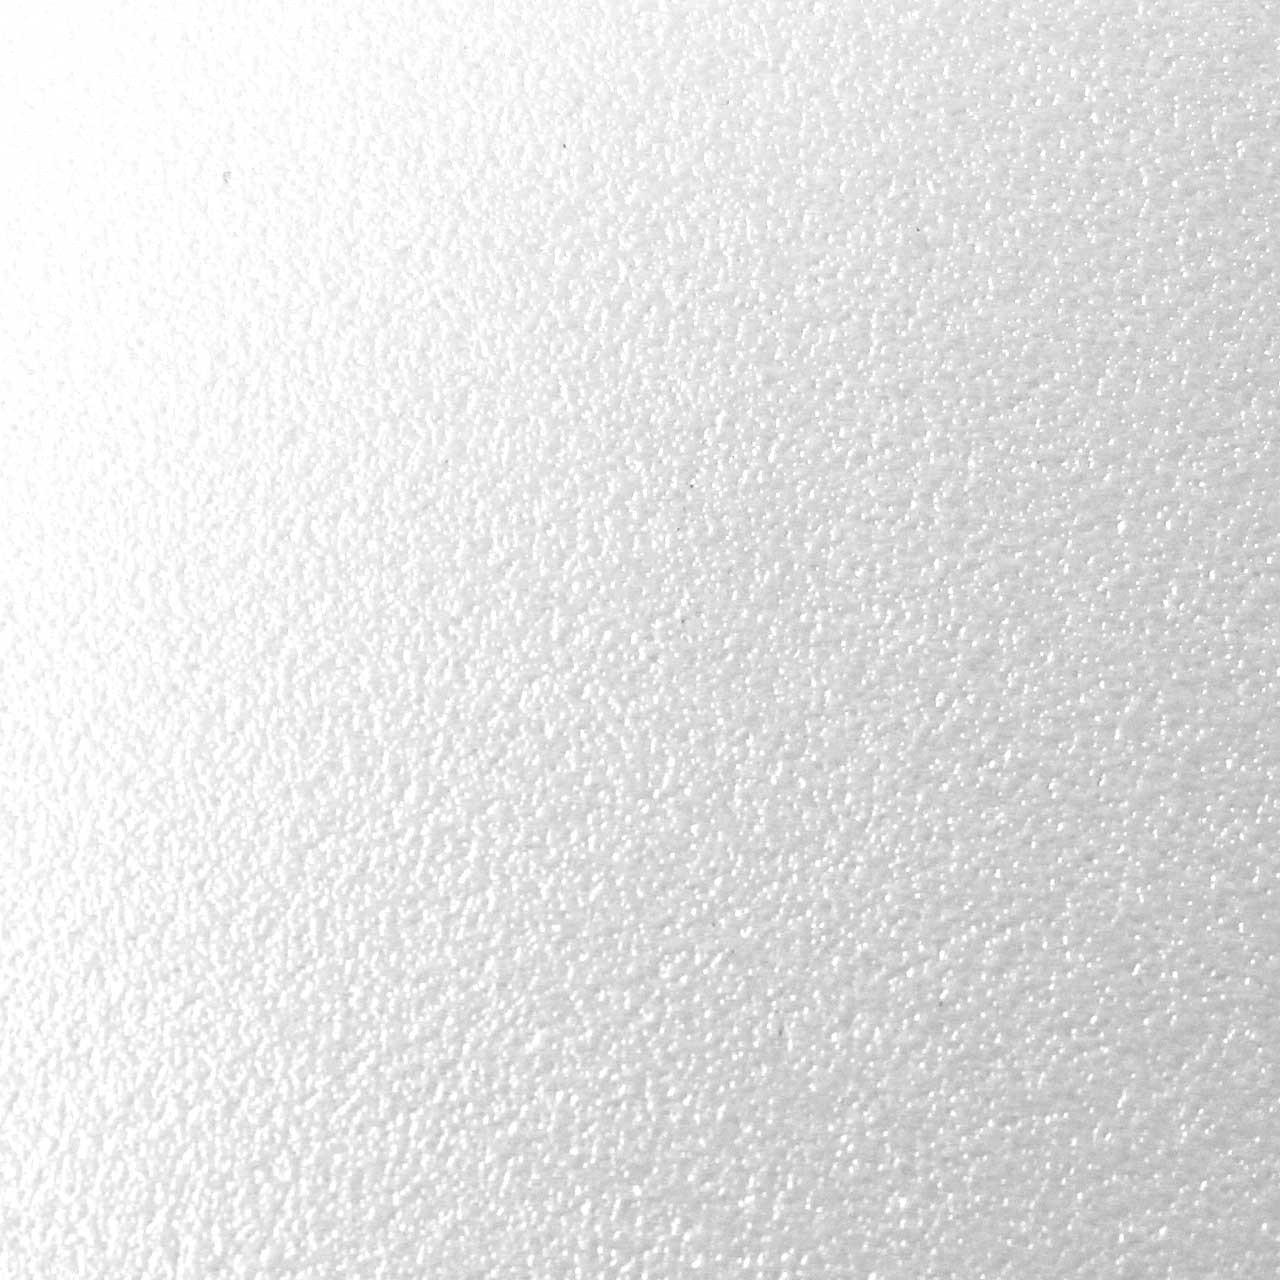 1 2 inch white custom cutting board cutting board for White cutting board used for